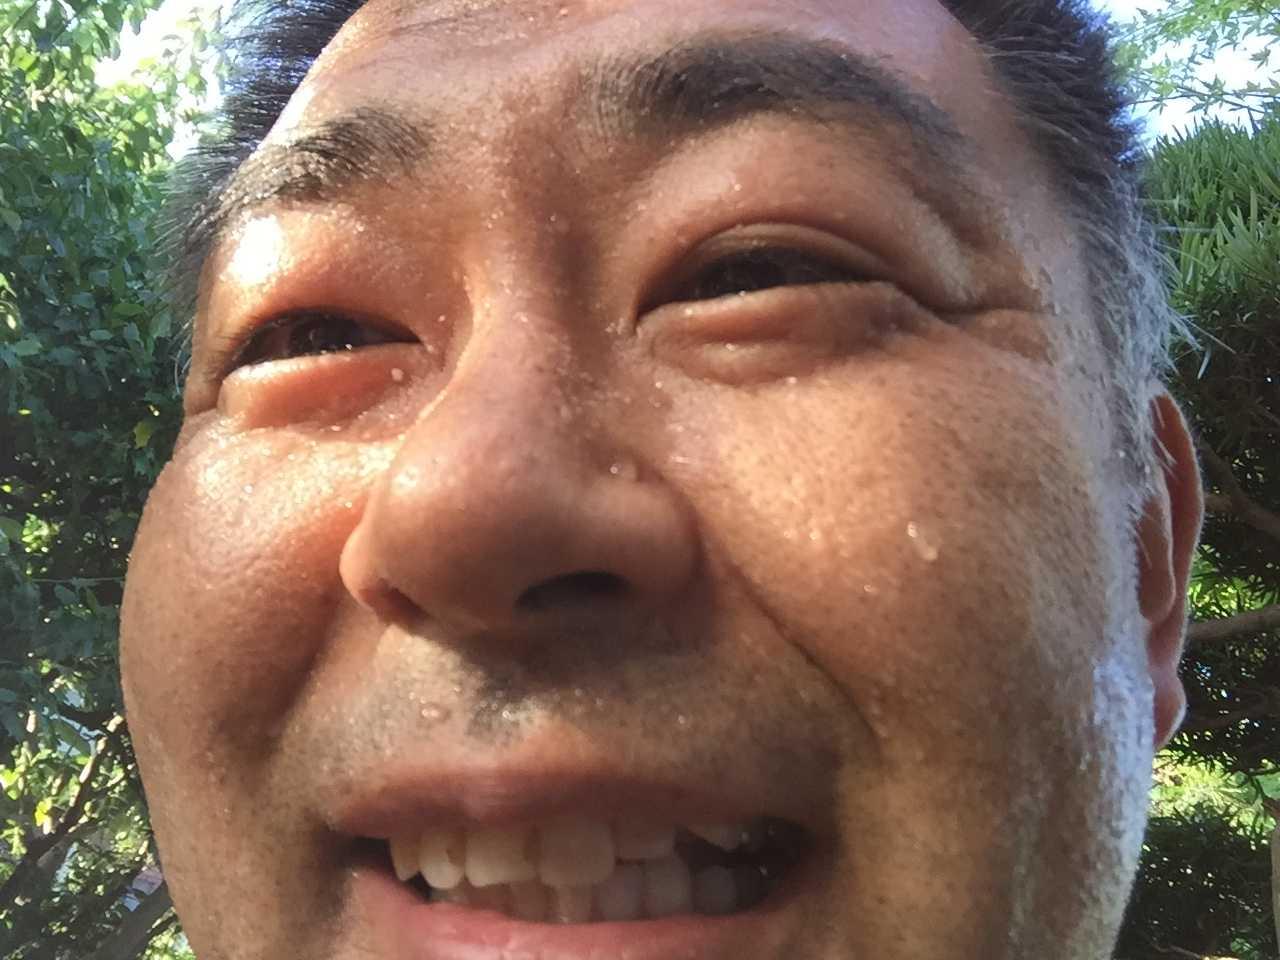 村内伸弘 - 最高の表情